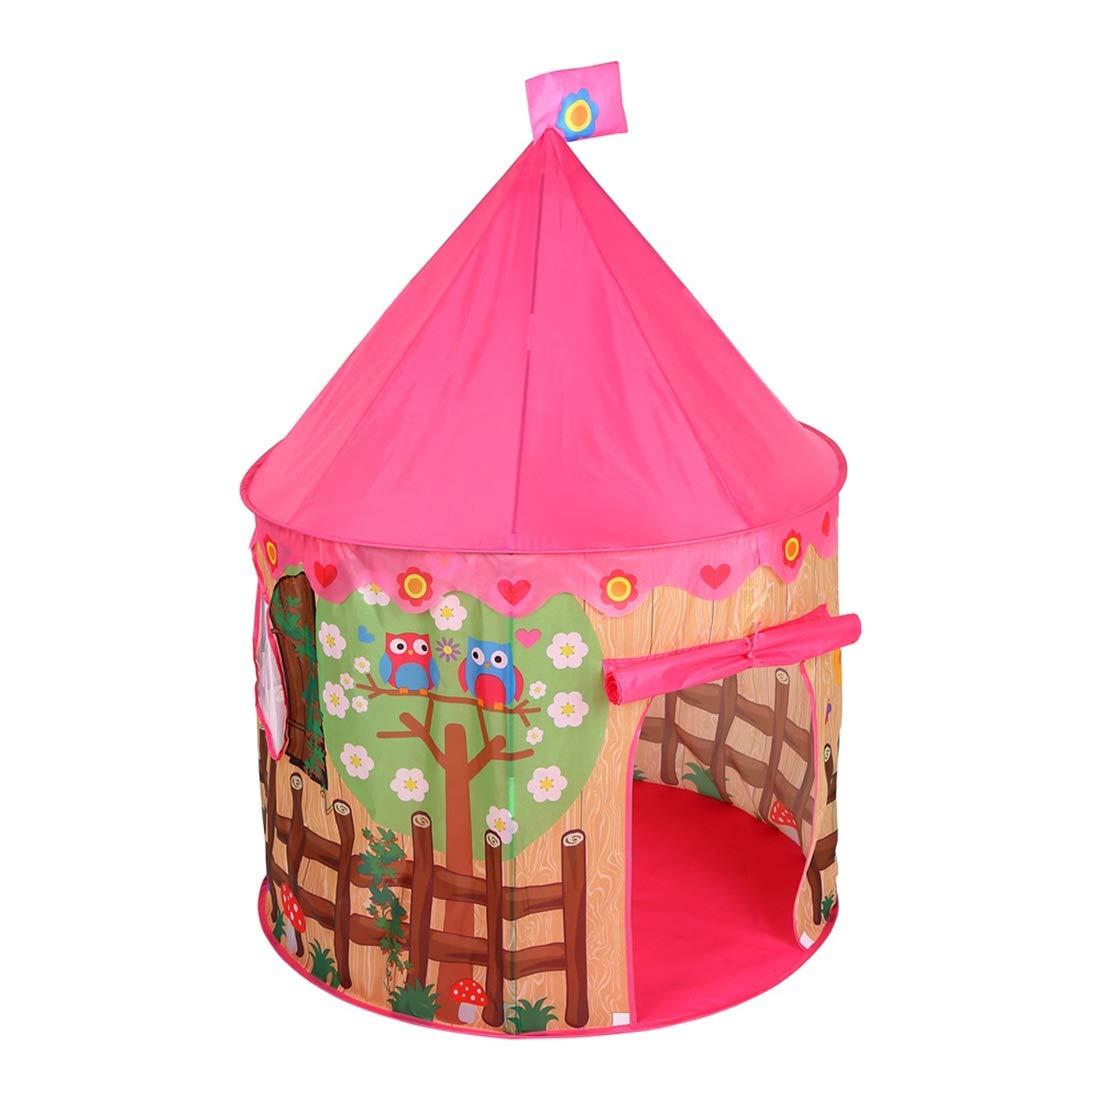 Nekovan ピンク 子供のための折り畳み式ポータブルプレイテント幼児室内用屋外劇場 (色 : B07R6DFXN8 ピンク) ピンク Nekovan B07R6DFXN8, SOAR(そあ)ショップ:f5092ee9 --- number-directory.top